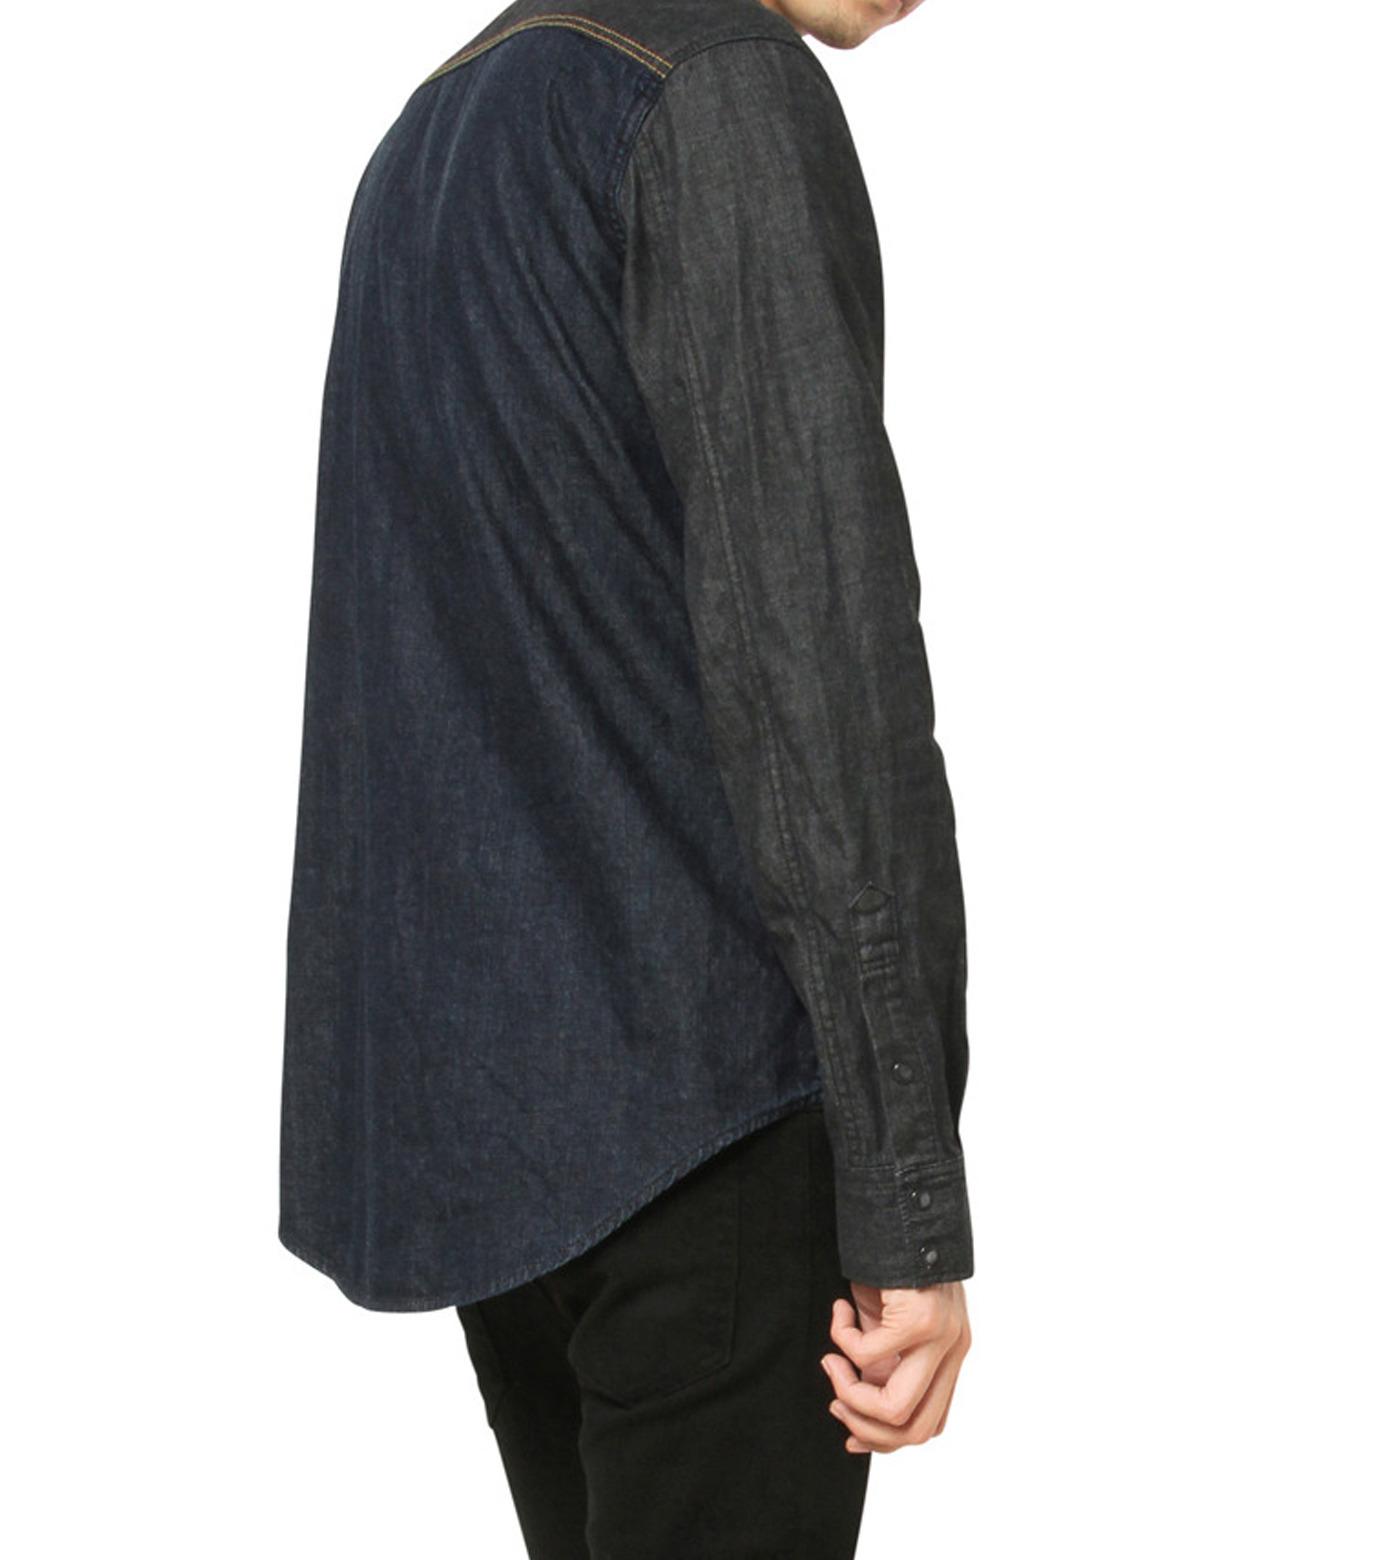 HL HEDDIE LOVU(エイチエル・エディールーヴ)のHL DENIM SHIRT-BLACK(シャツ/shirt)-17A93003-13 拡大詳細画像6